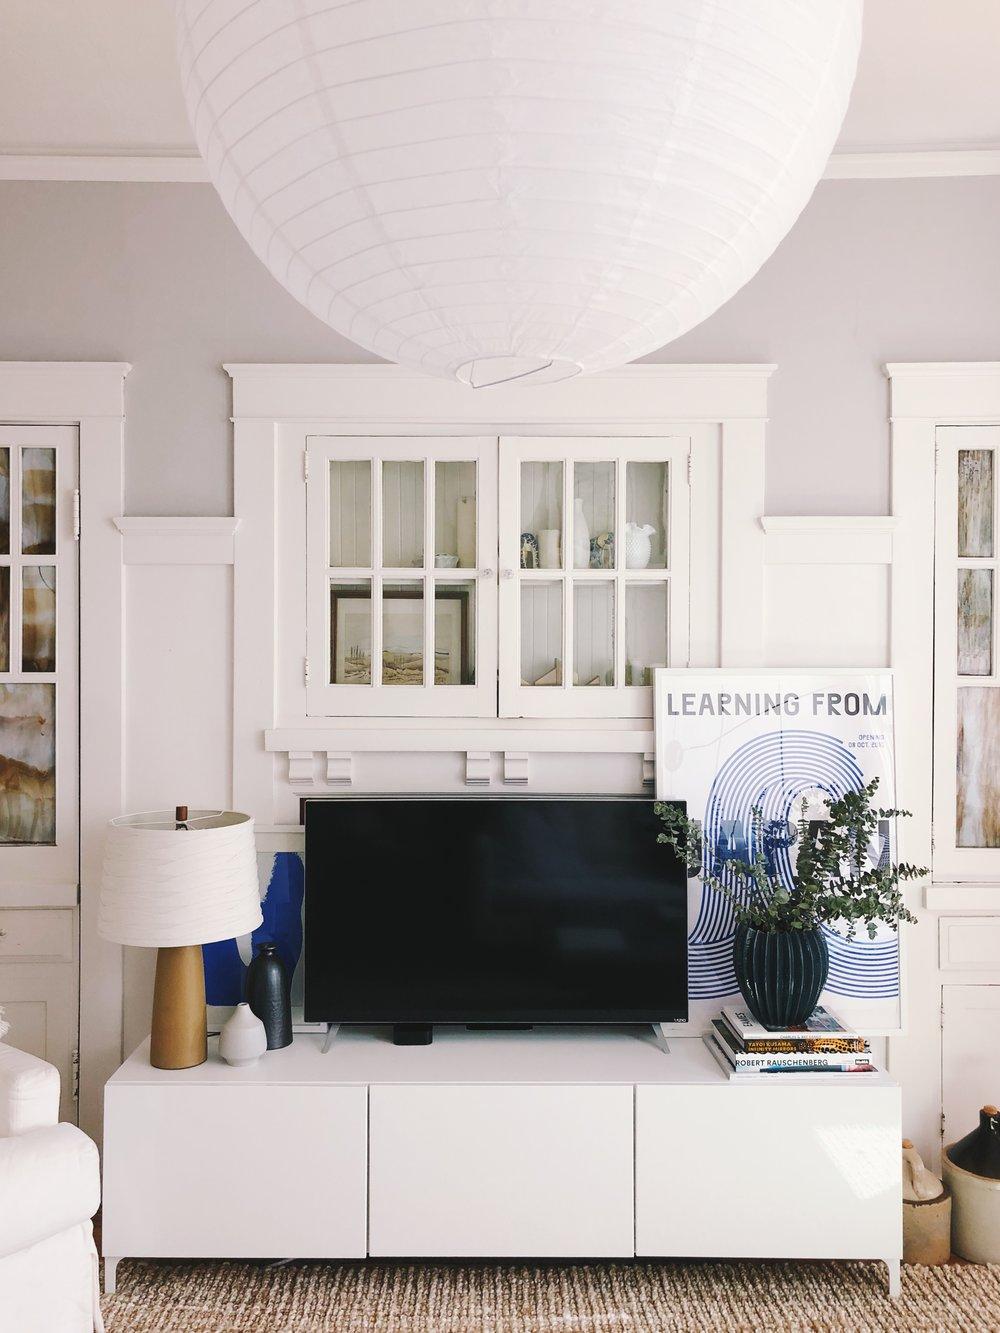 Cabinet: IKEA, lamp: vintage Martz lamp ( similar ), small white vase:  CB2 , black vase: vintage, Japan poster:  Design Museum Danmark , blue pot: Anthropologie